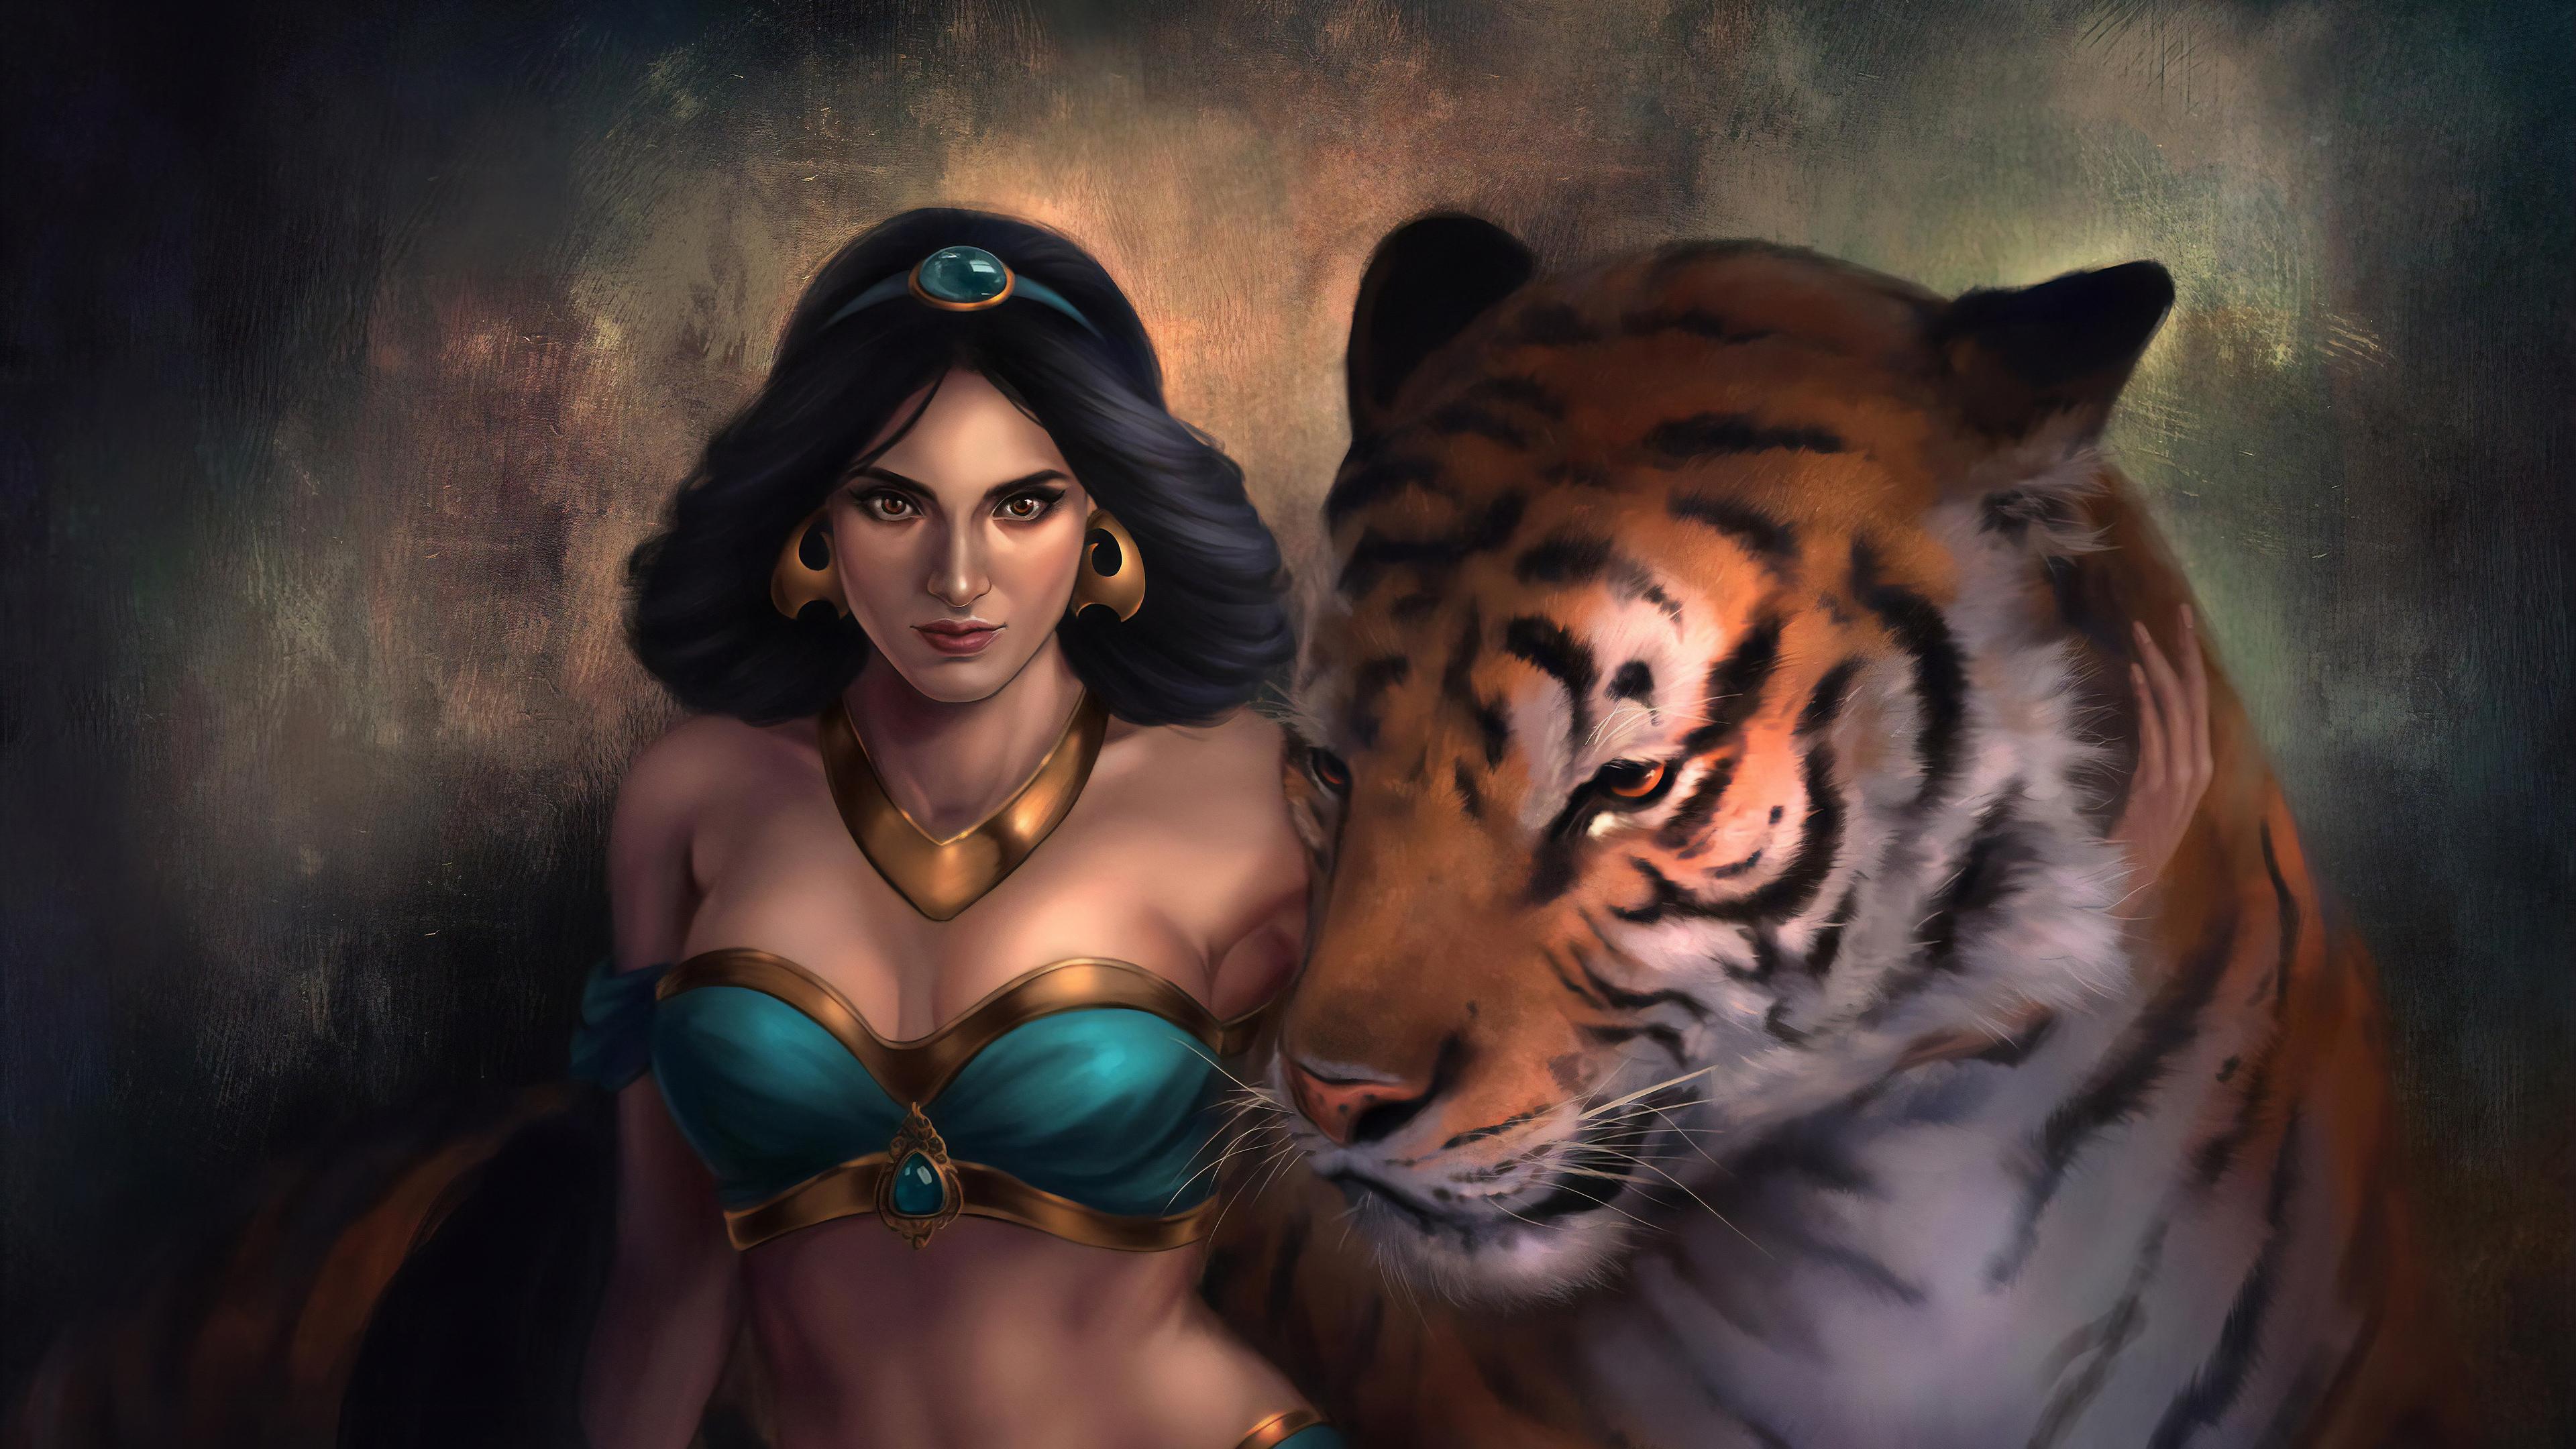 Princess Jasmine And Raja Hd Movies 4k Wallpapers Images